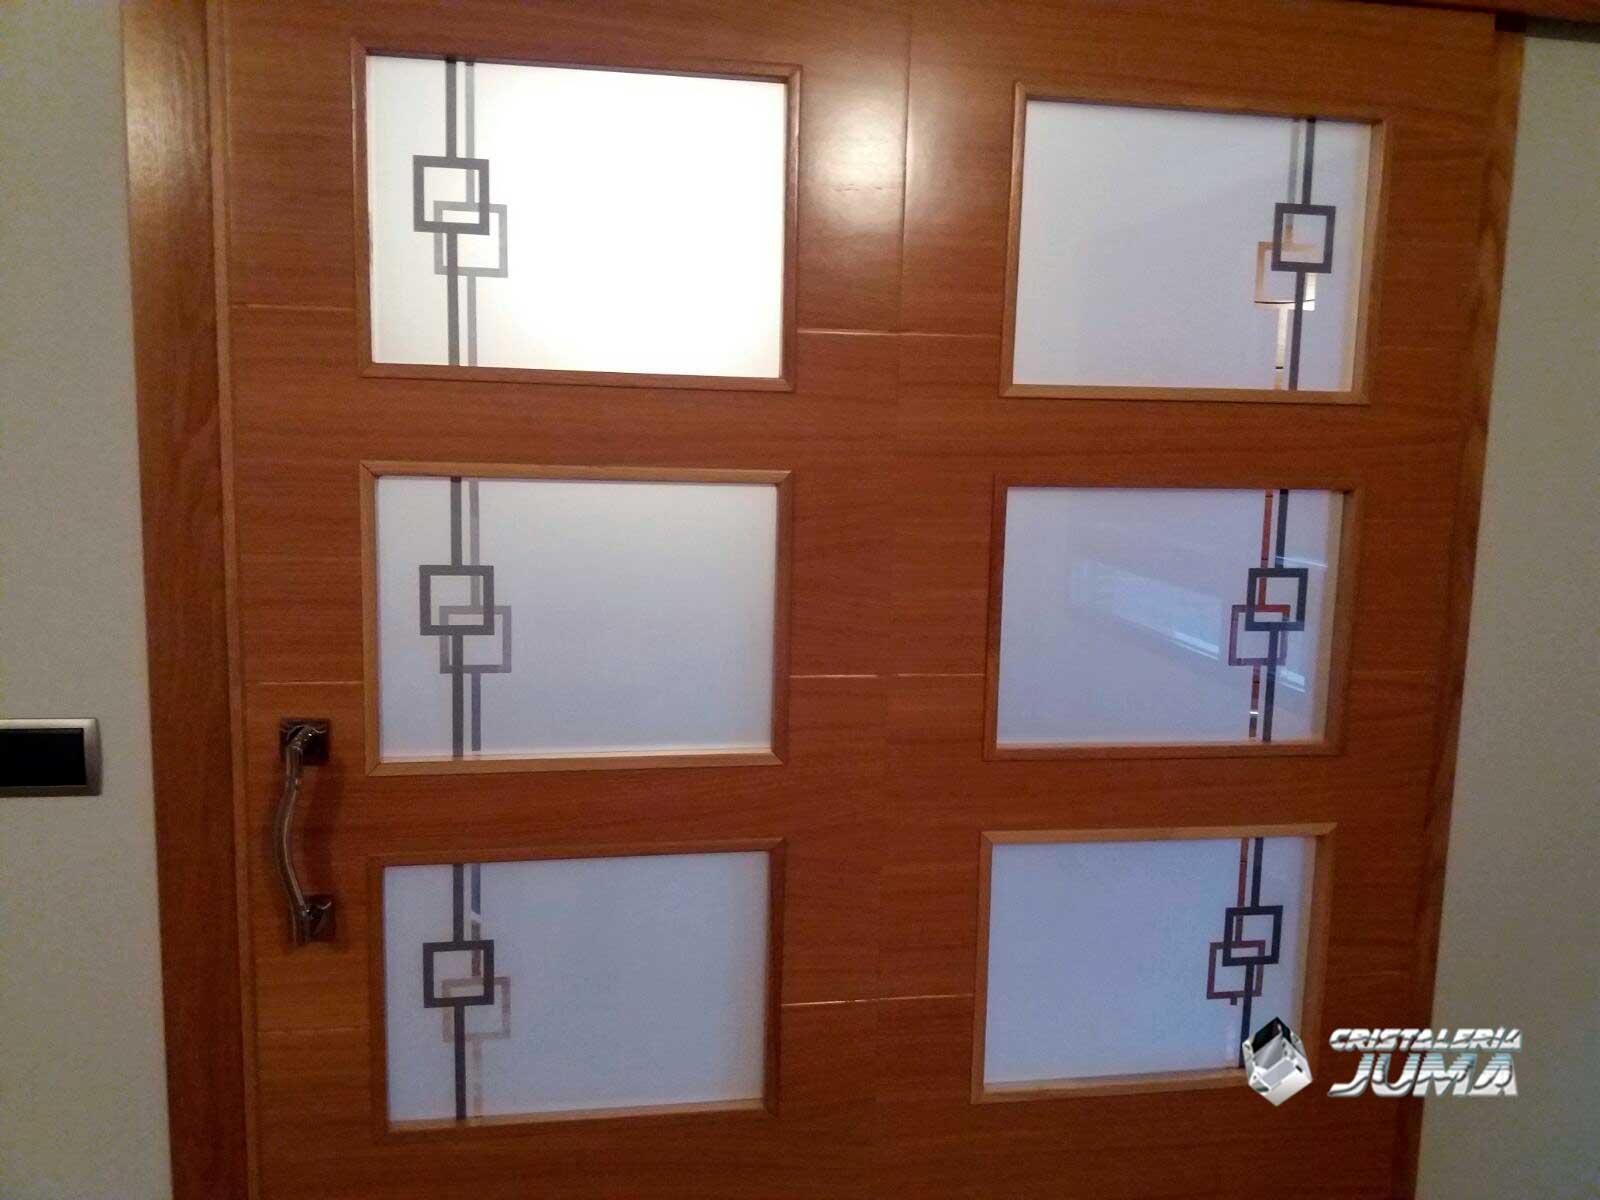 Puertas de cristal cristaler a juma - Cristales decorados para puertas ...